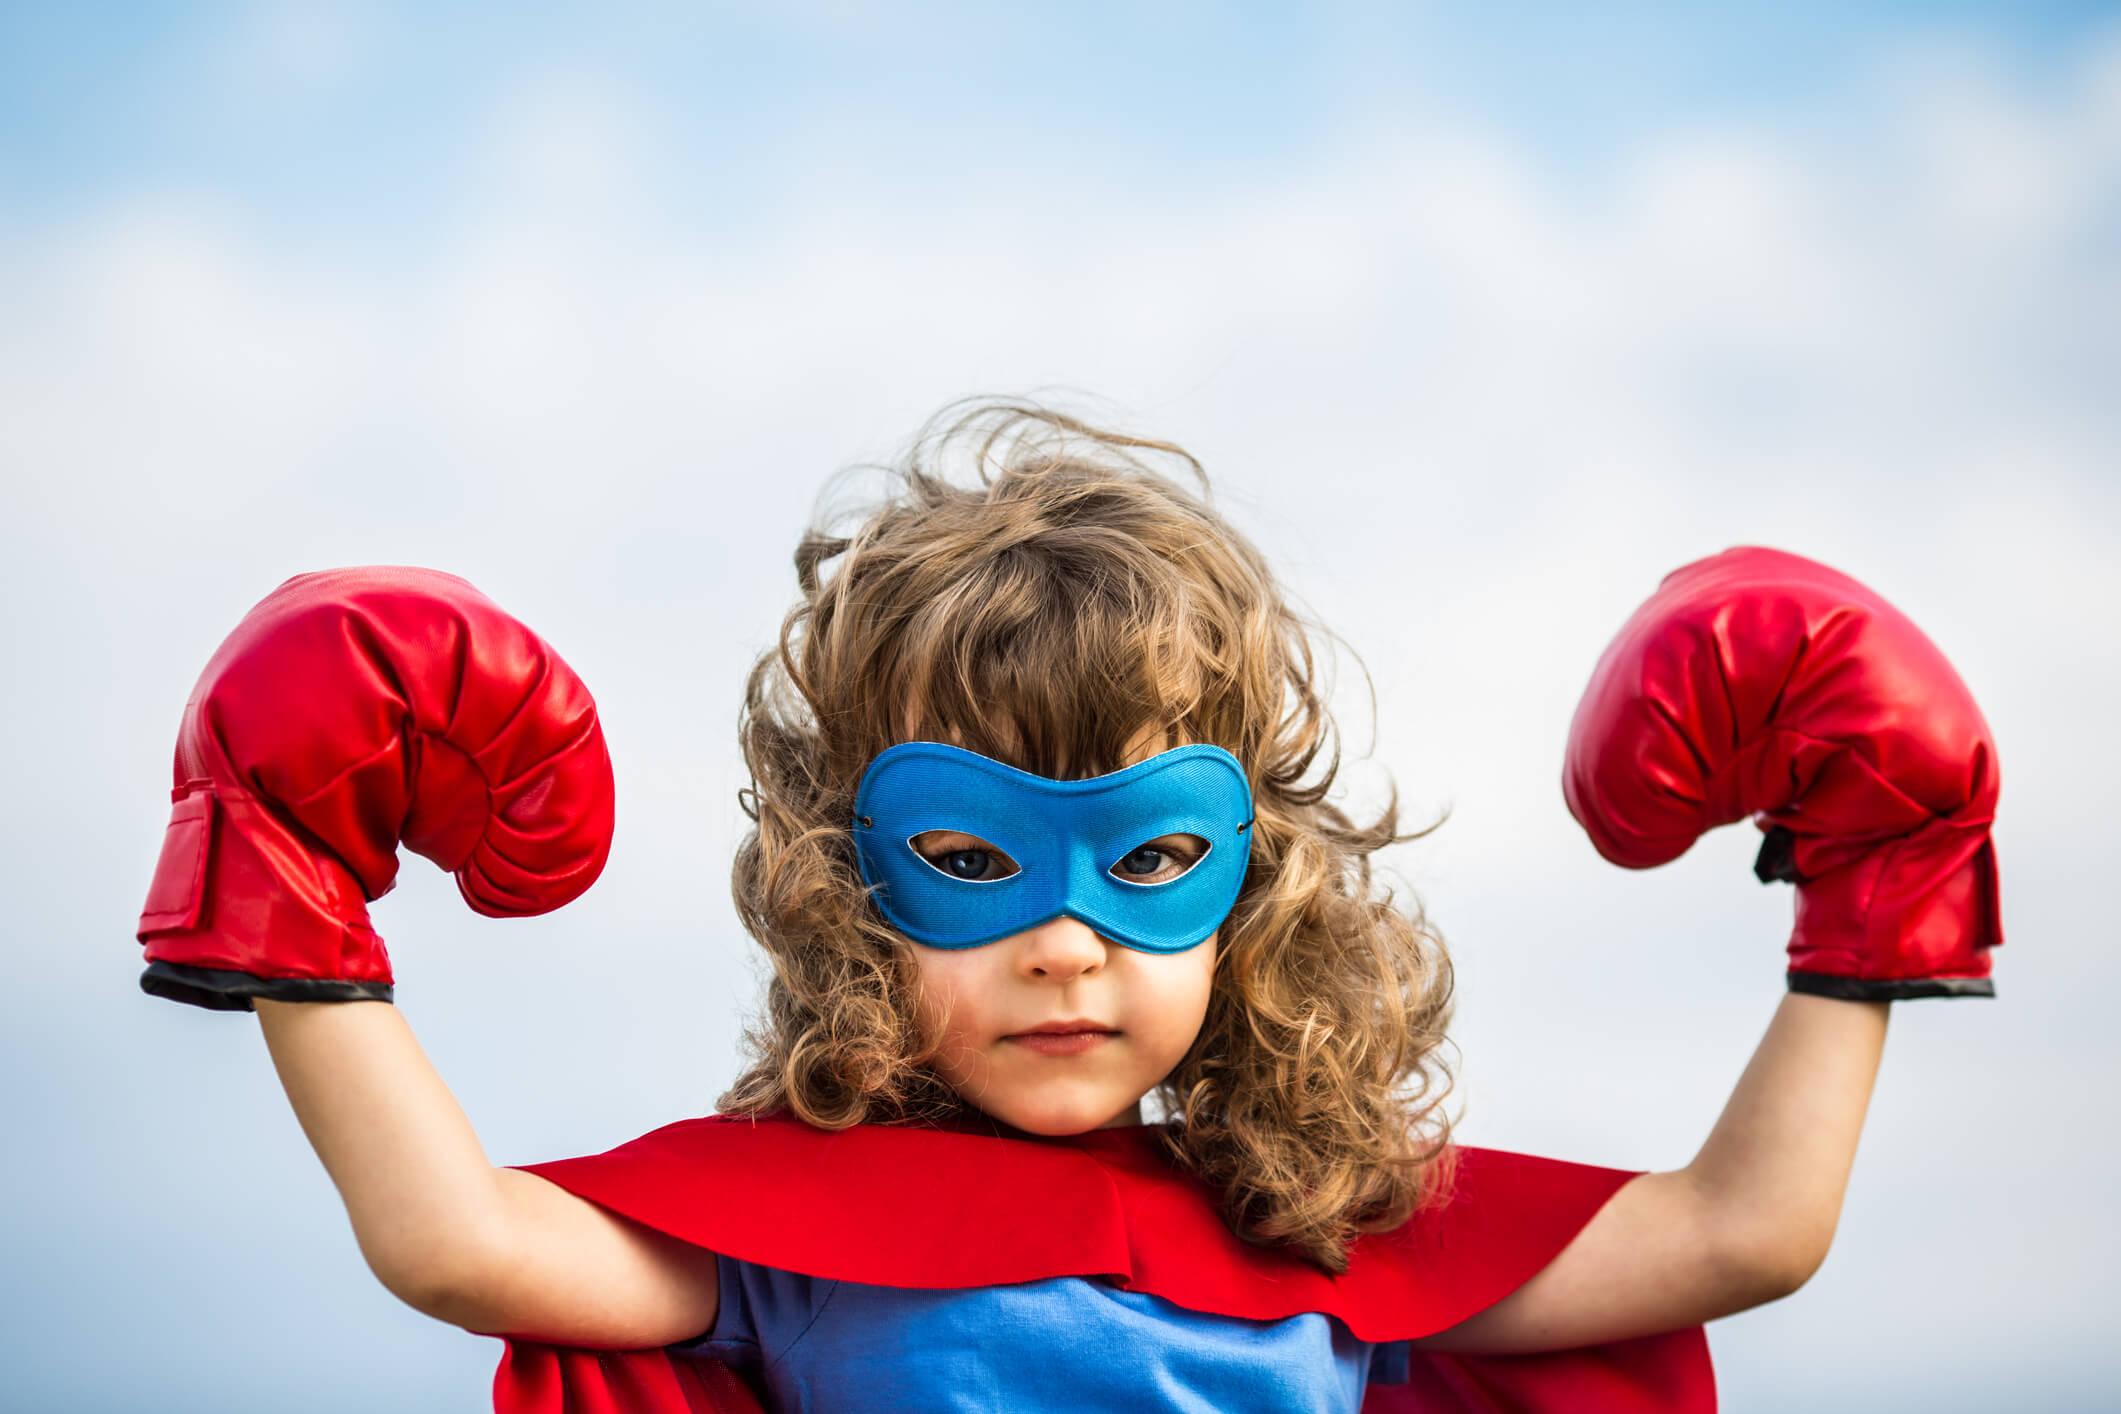 Bambina mascherata da Superman, con maschera e guantoni.